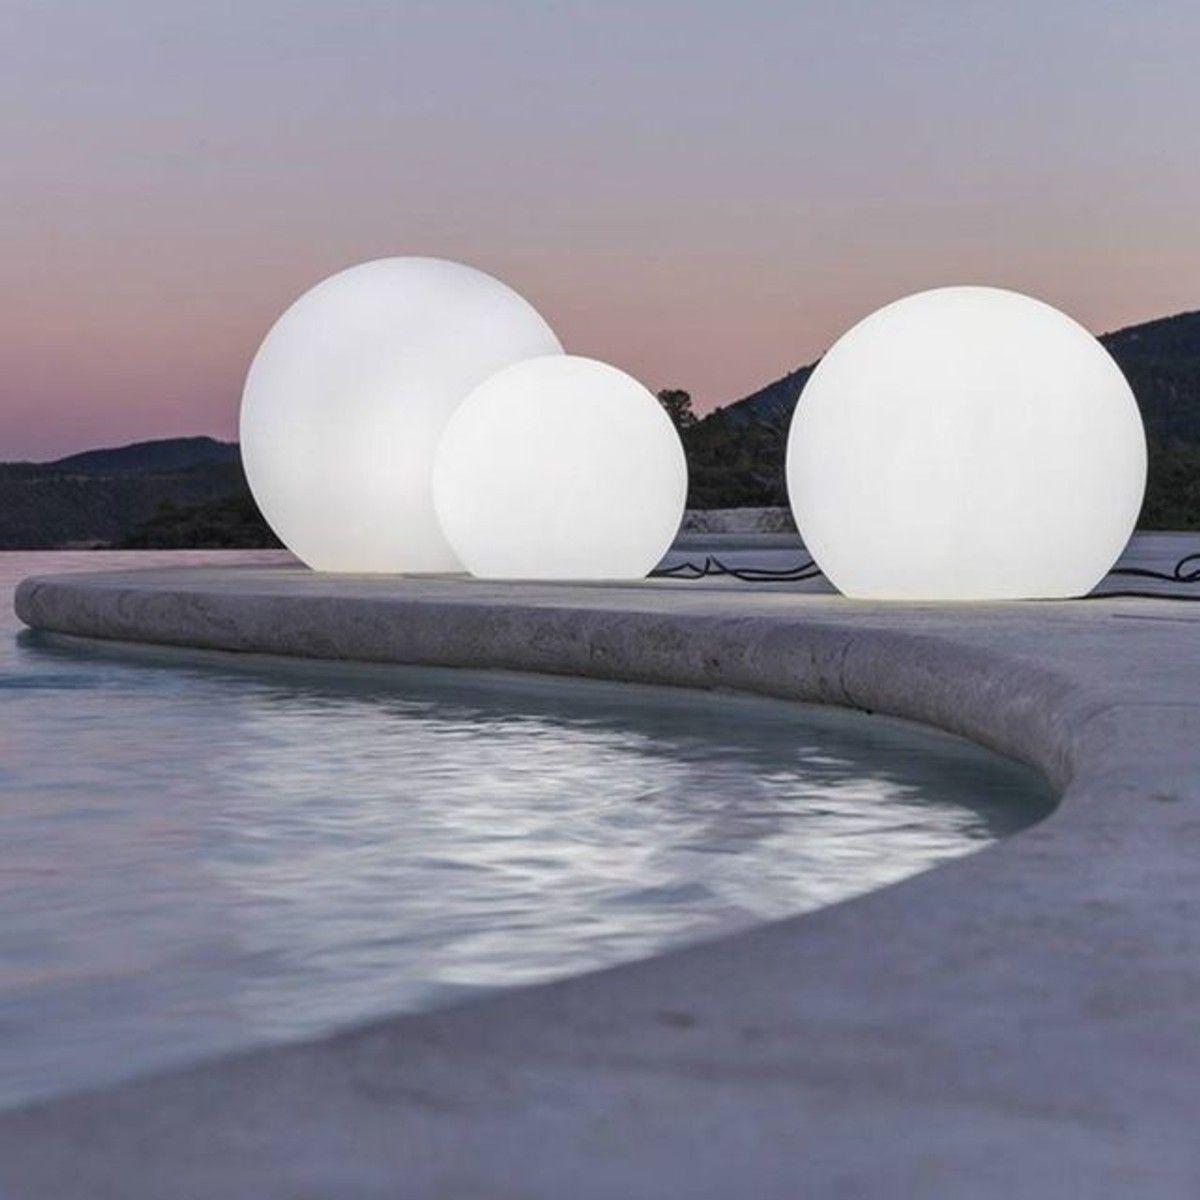 Objets Lumineux Polypropylène Sphère Et Rond Buly - Taille ... à Sphere Lumineuse Jardin